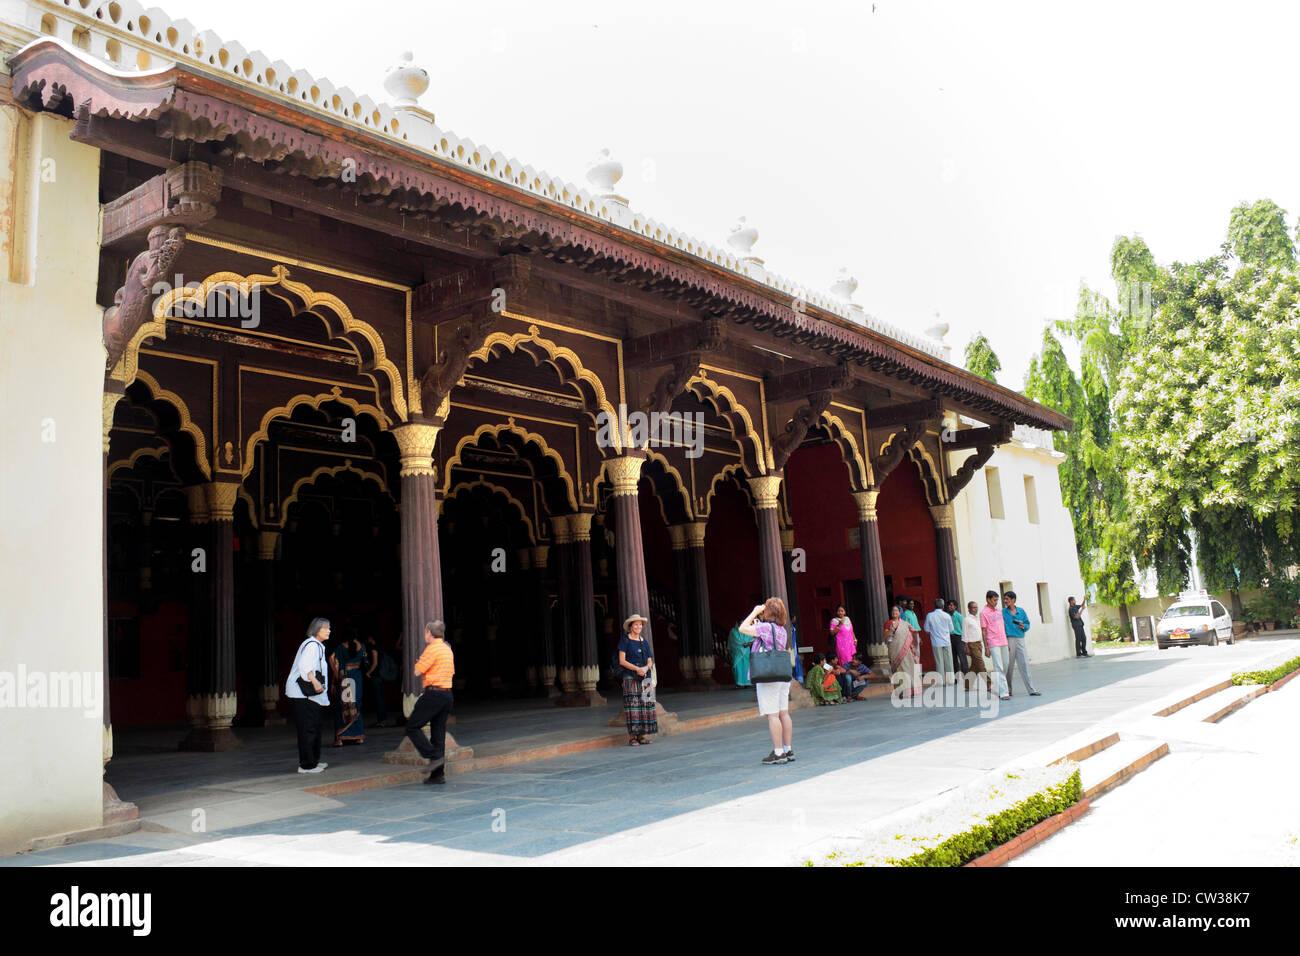 Tipu Sultan's,, été, Palace, Bangalore, Karnataka, Inde Banque D'Images